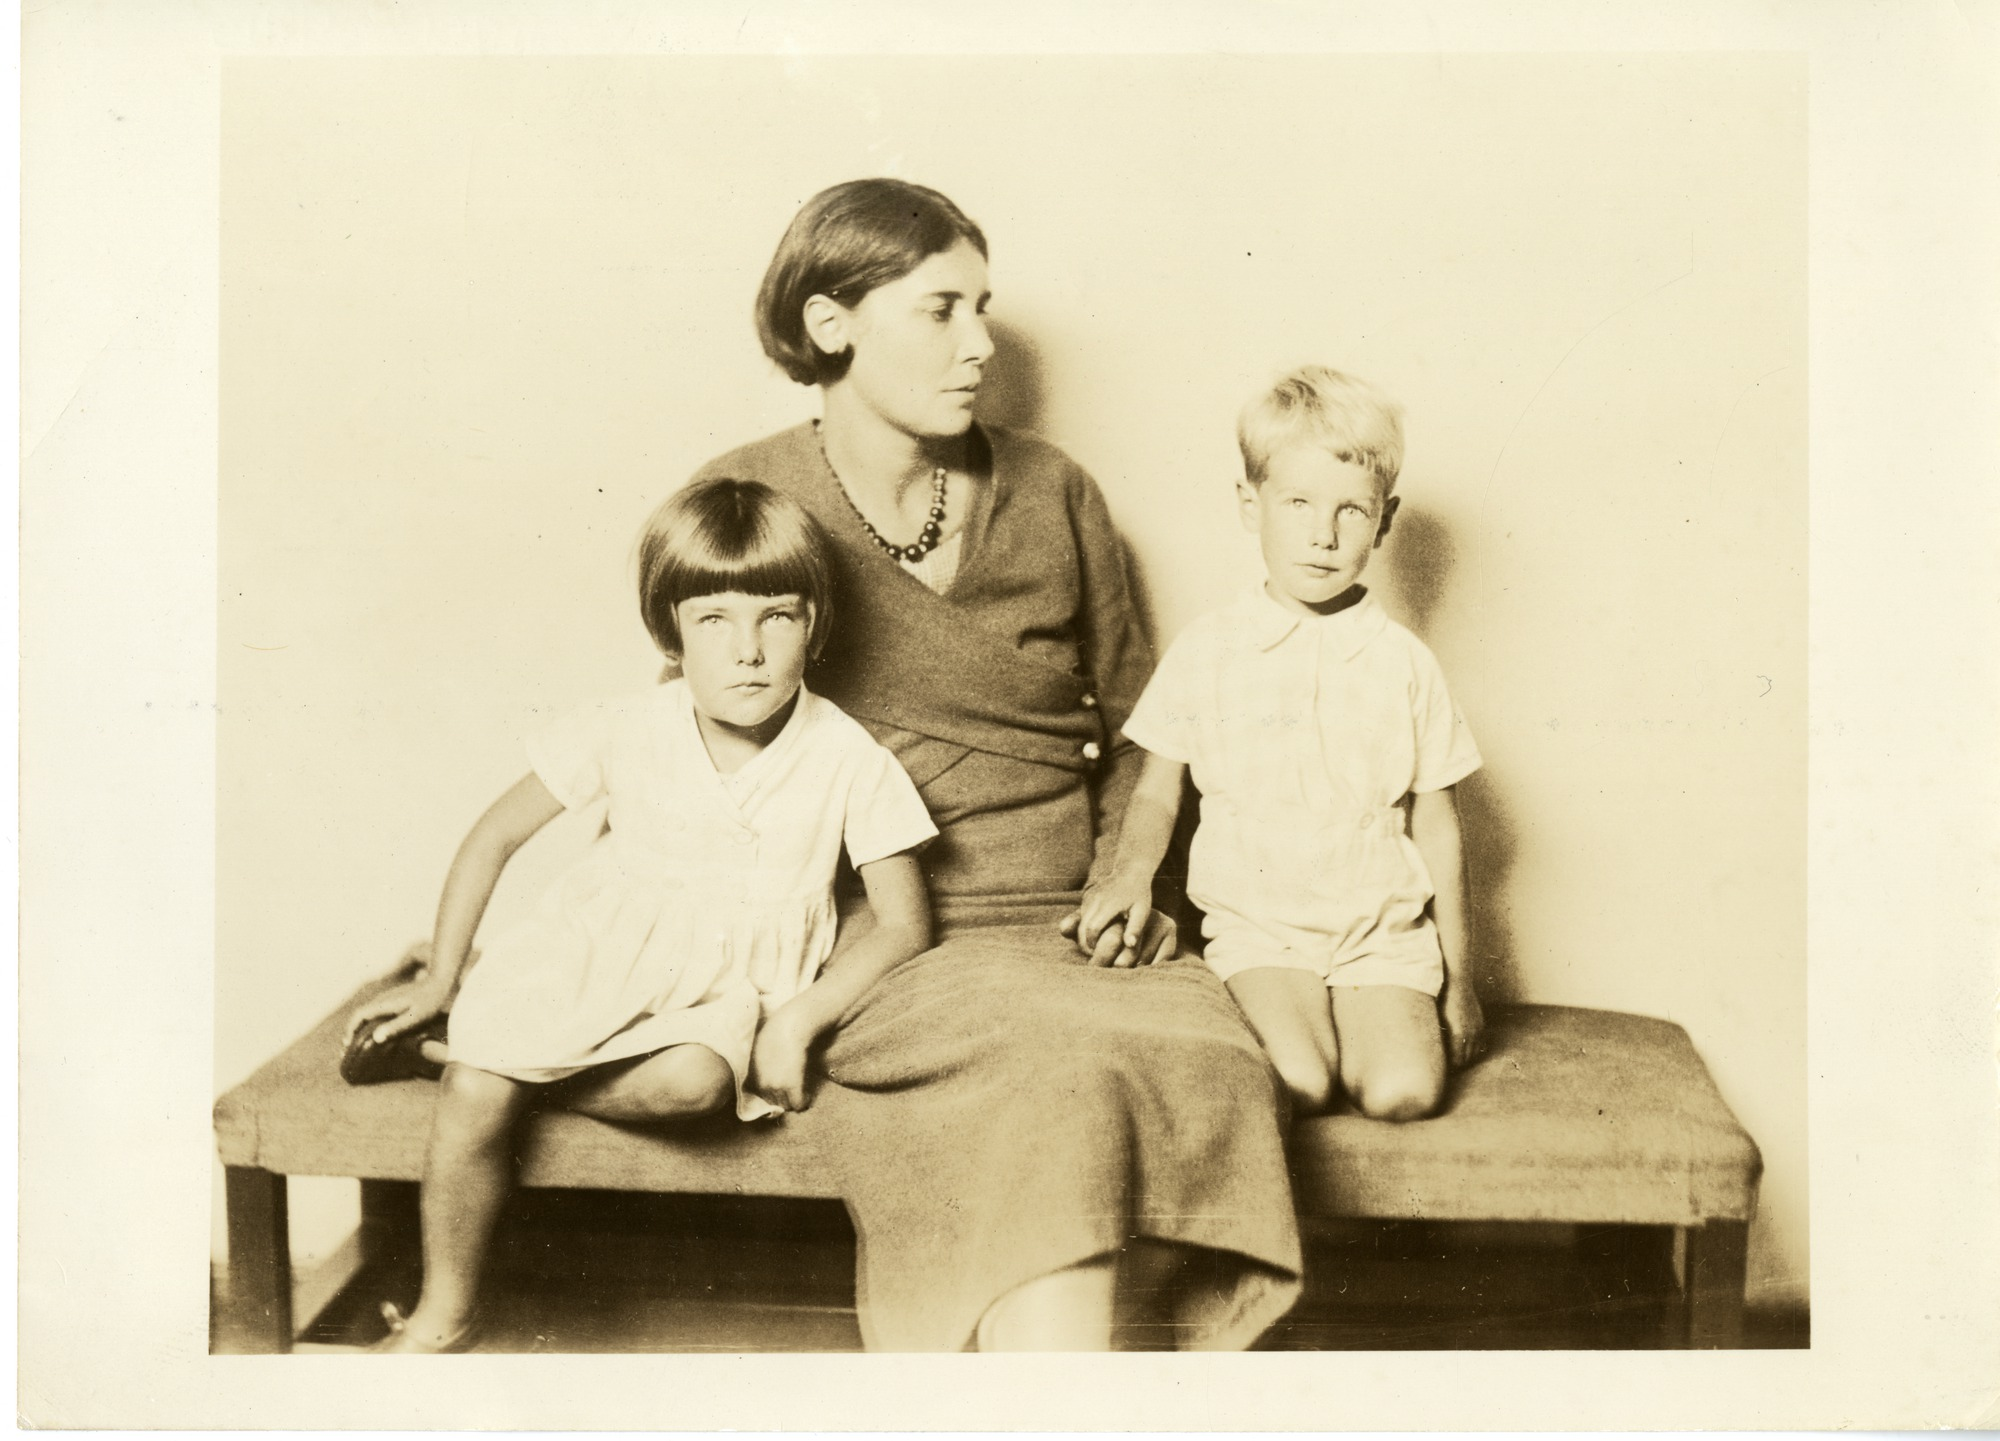 Posters Till Kok : FileWinifred May de Kok (18931969) and her childrenjpg  Wikimedia